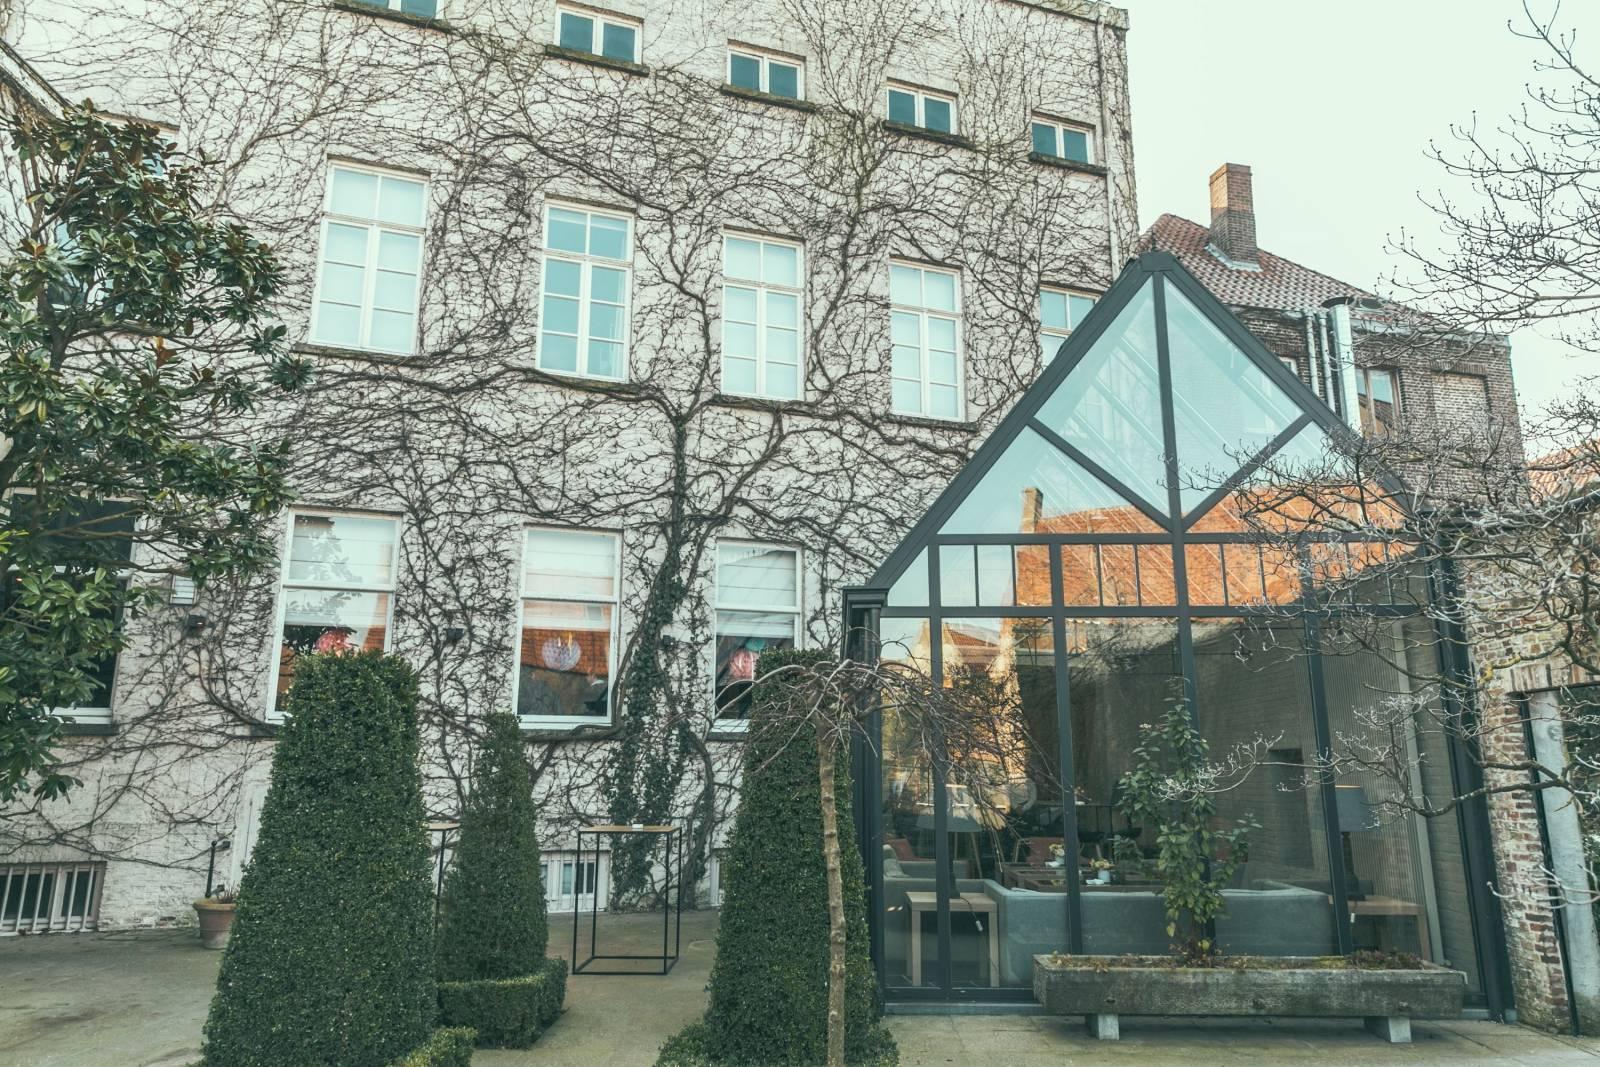 De Karmeliet - Feestzaal - House of Weddings  - 25